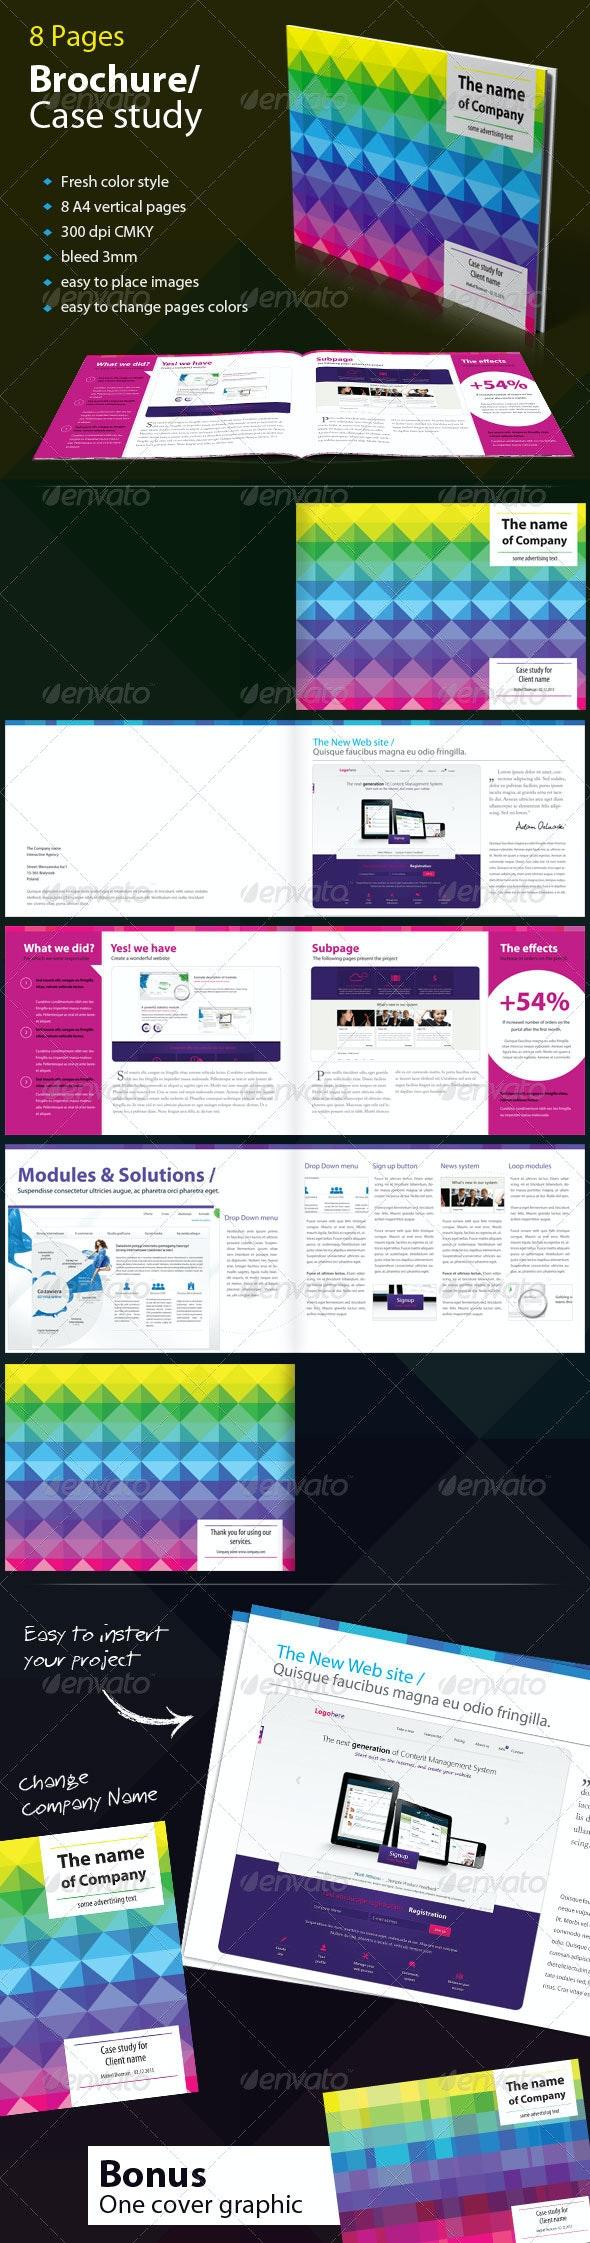 Brochure / Case Study - Fresh Colors - Brochures Print Templates